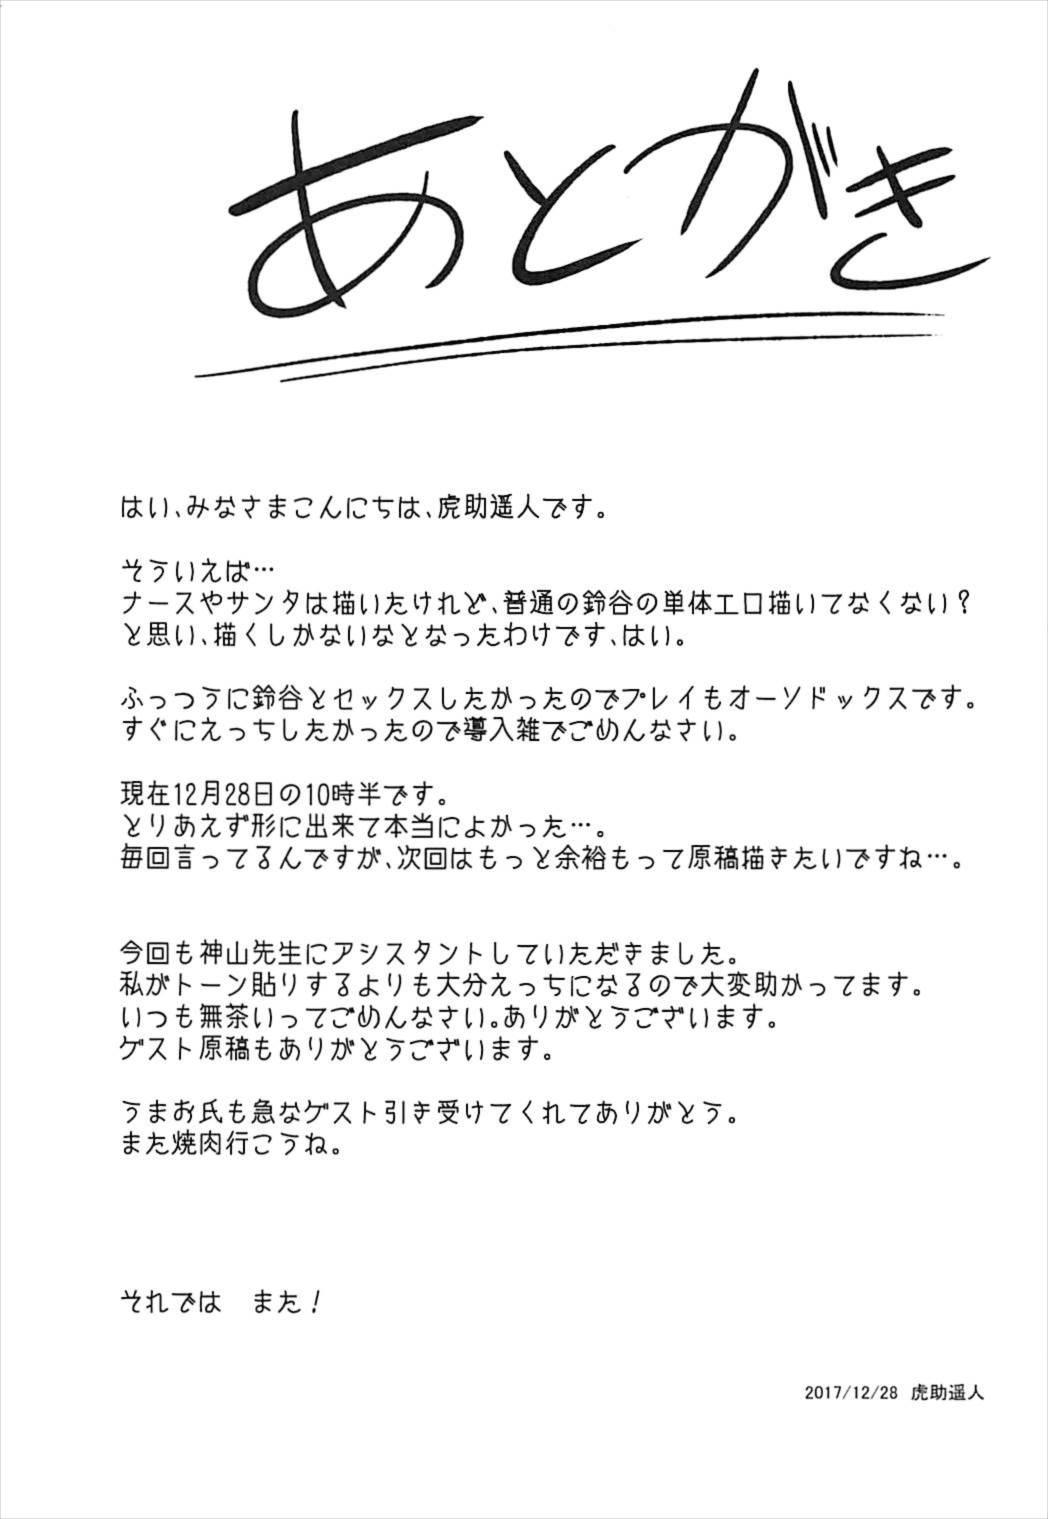 Suzuya to Ecchi Suru? 19